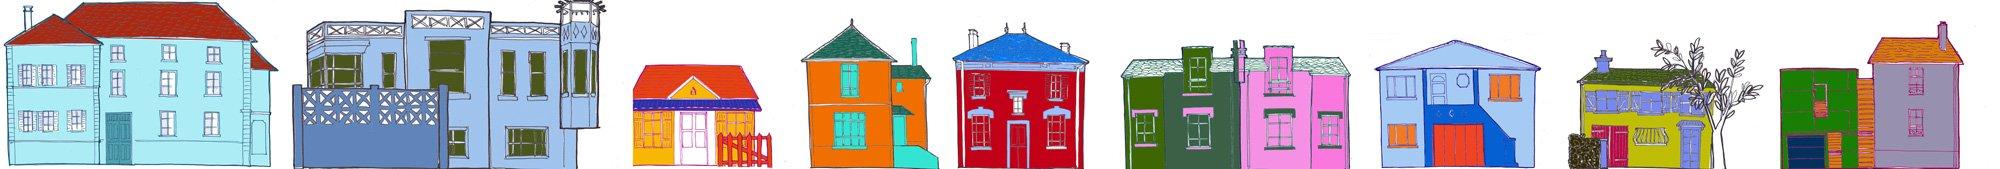 mathilde_meignan-rize-maisons2